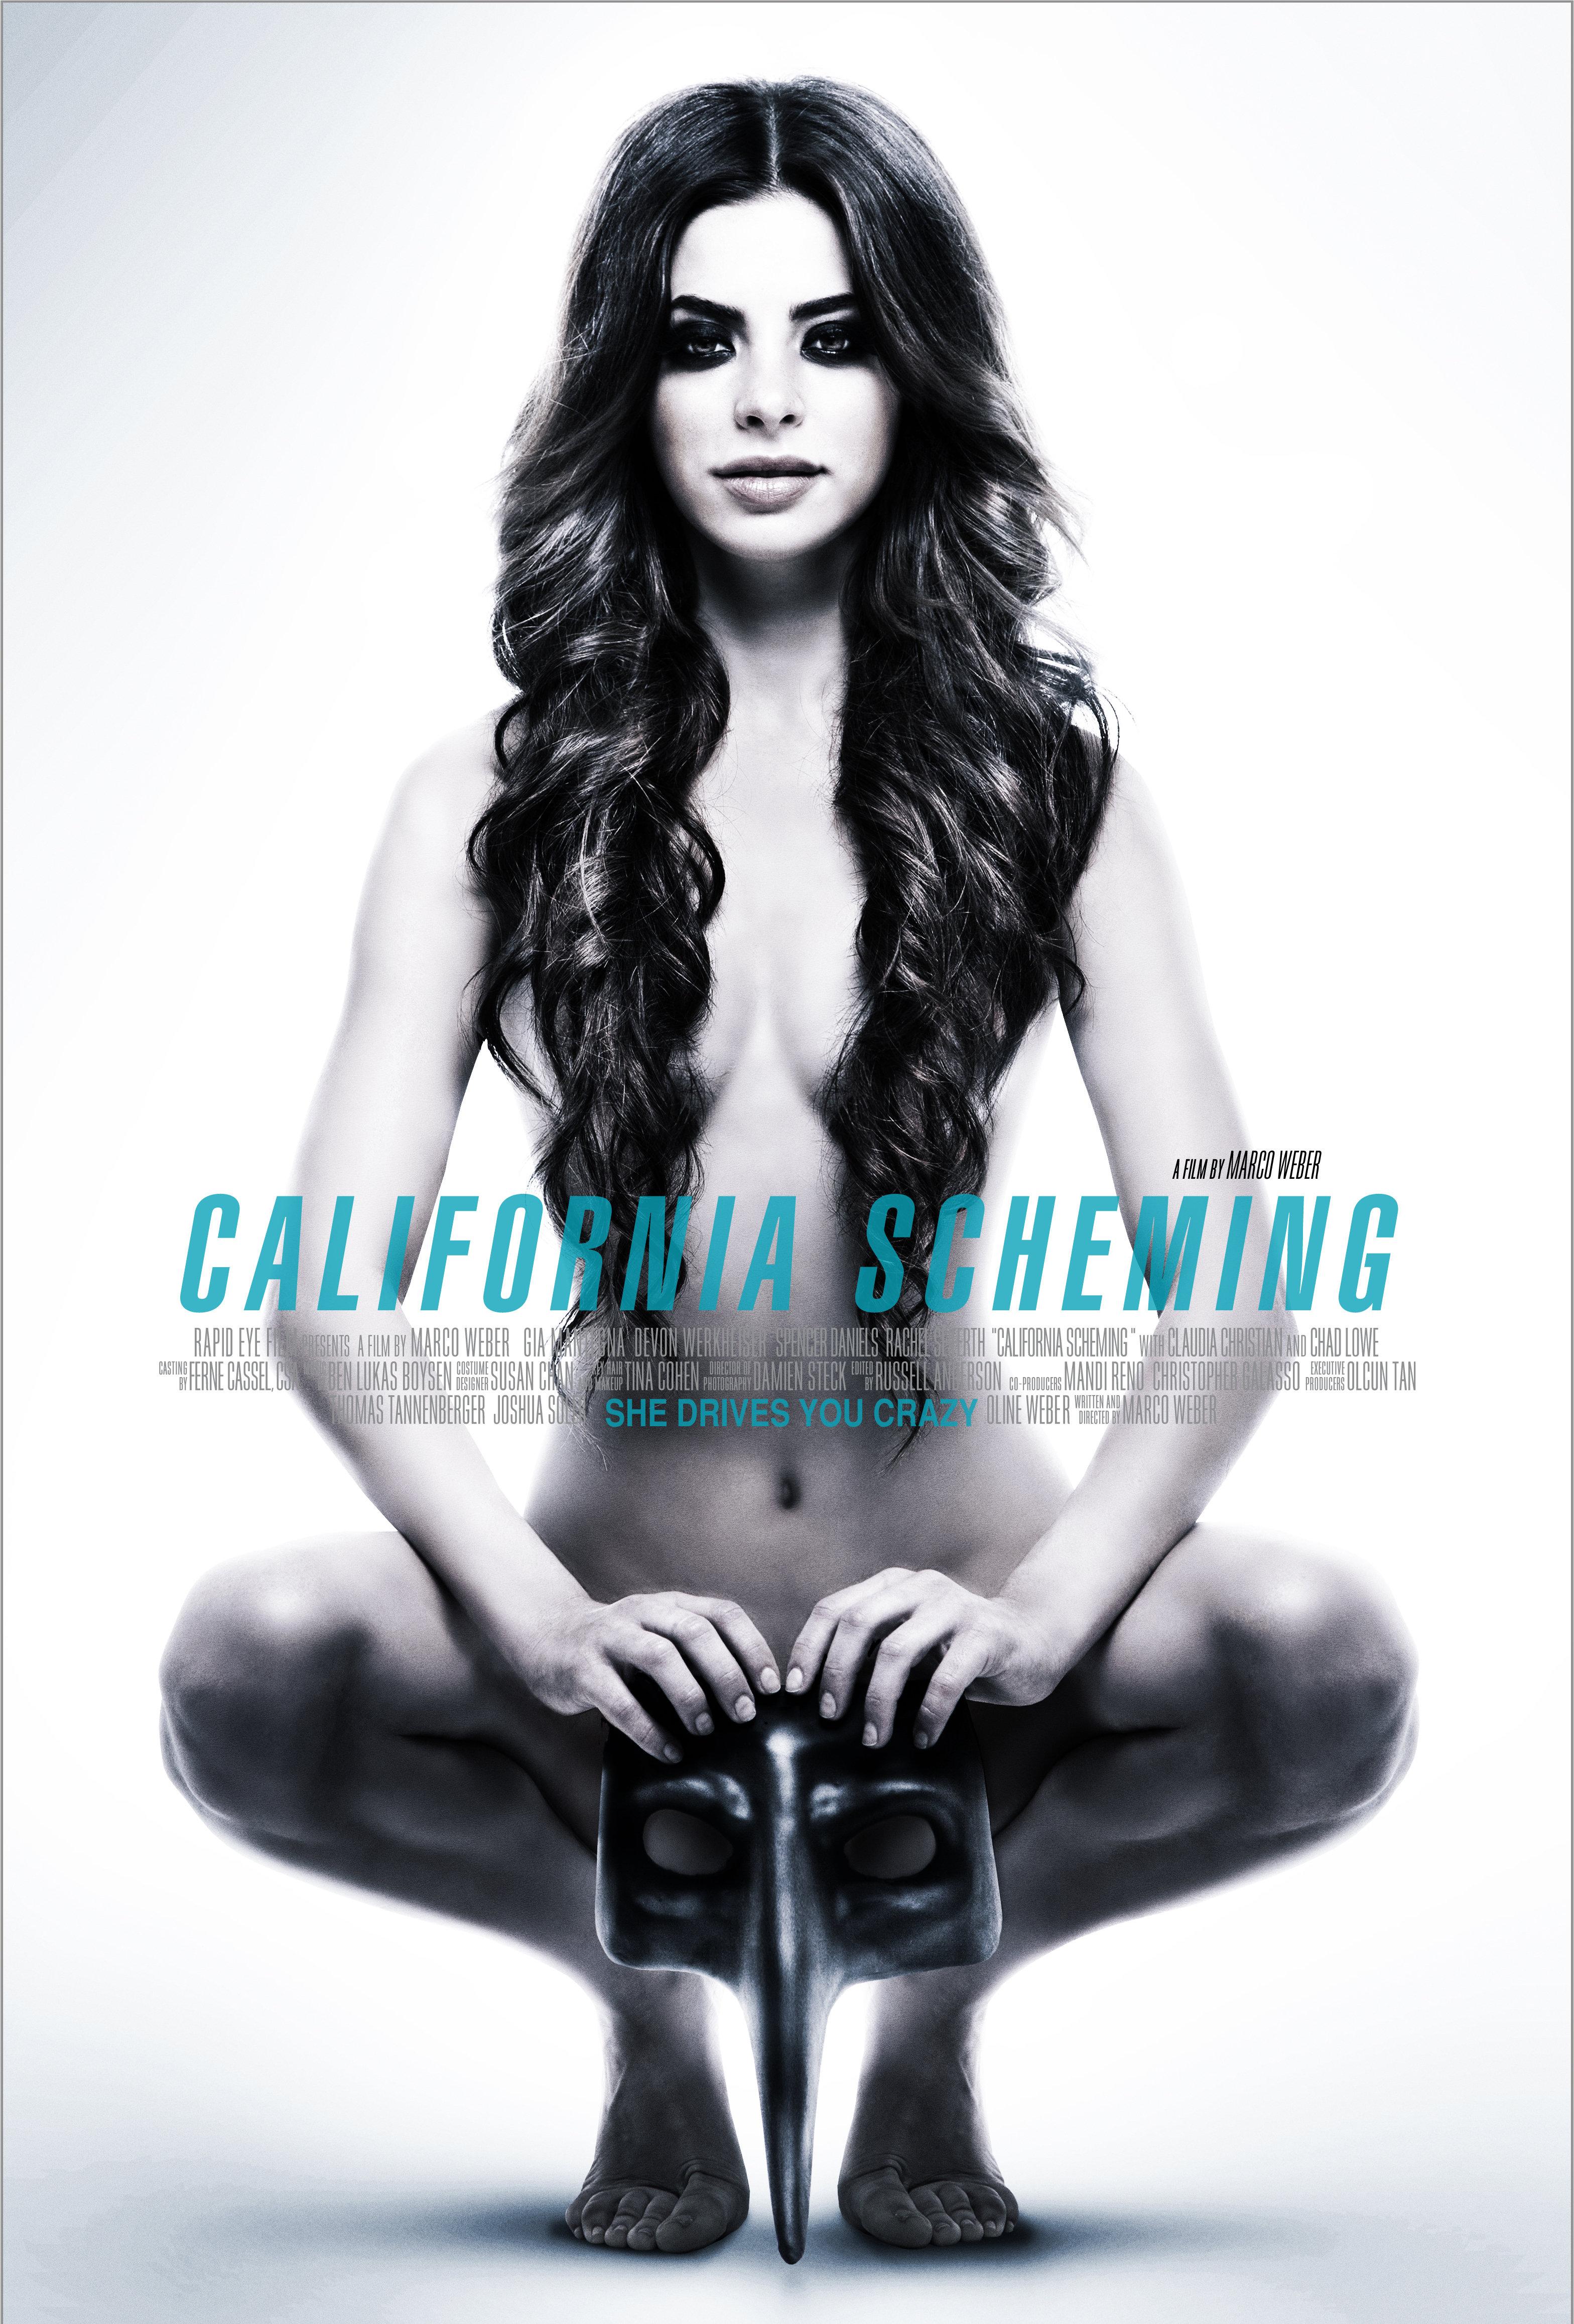 Image California Scheming Watch Full Movie Free Online